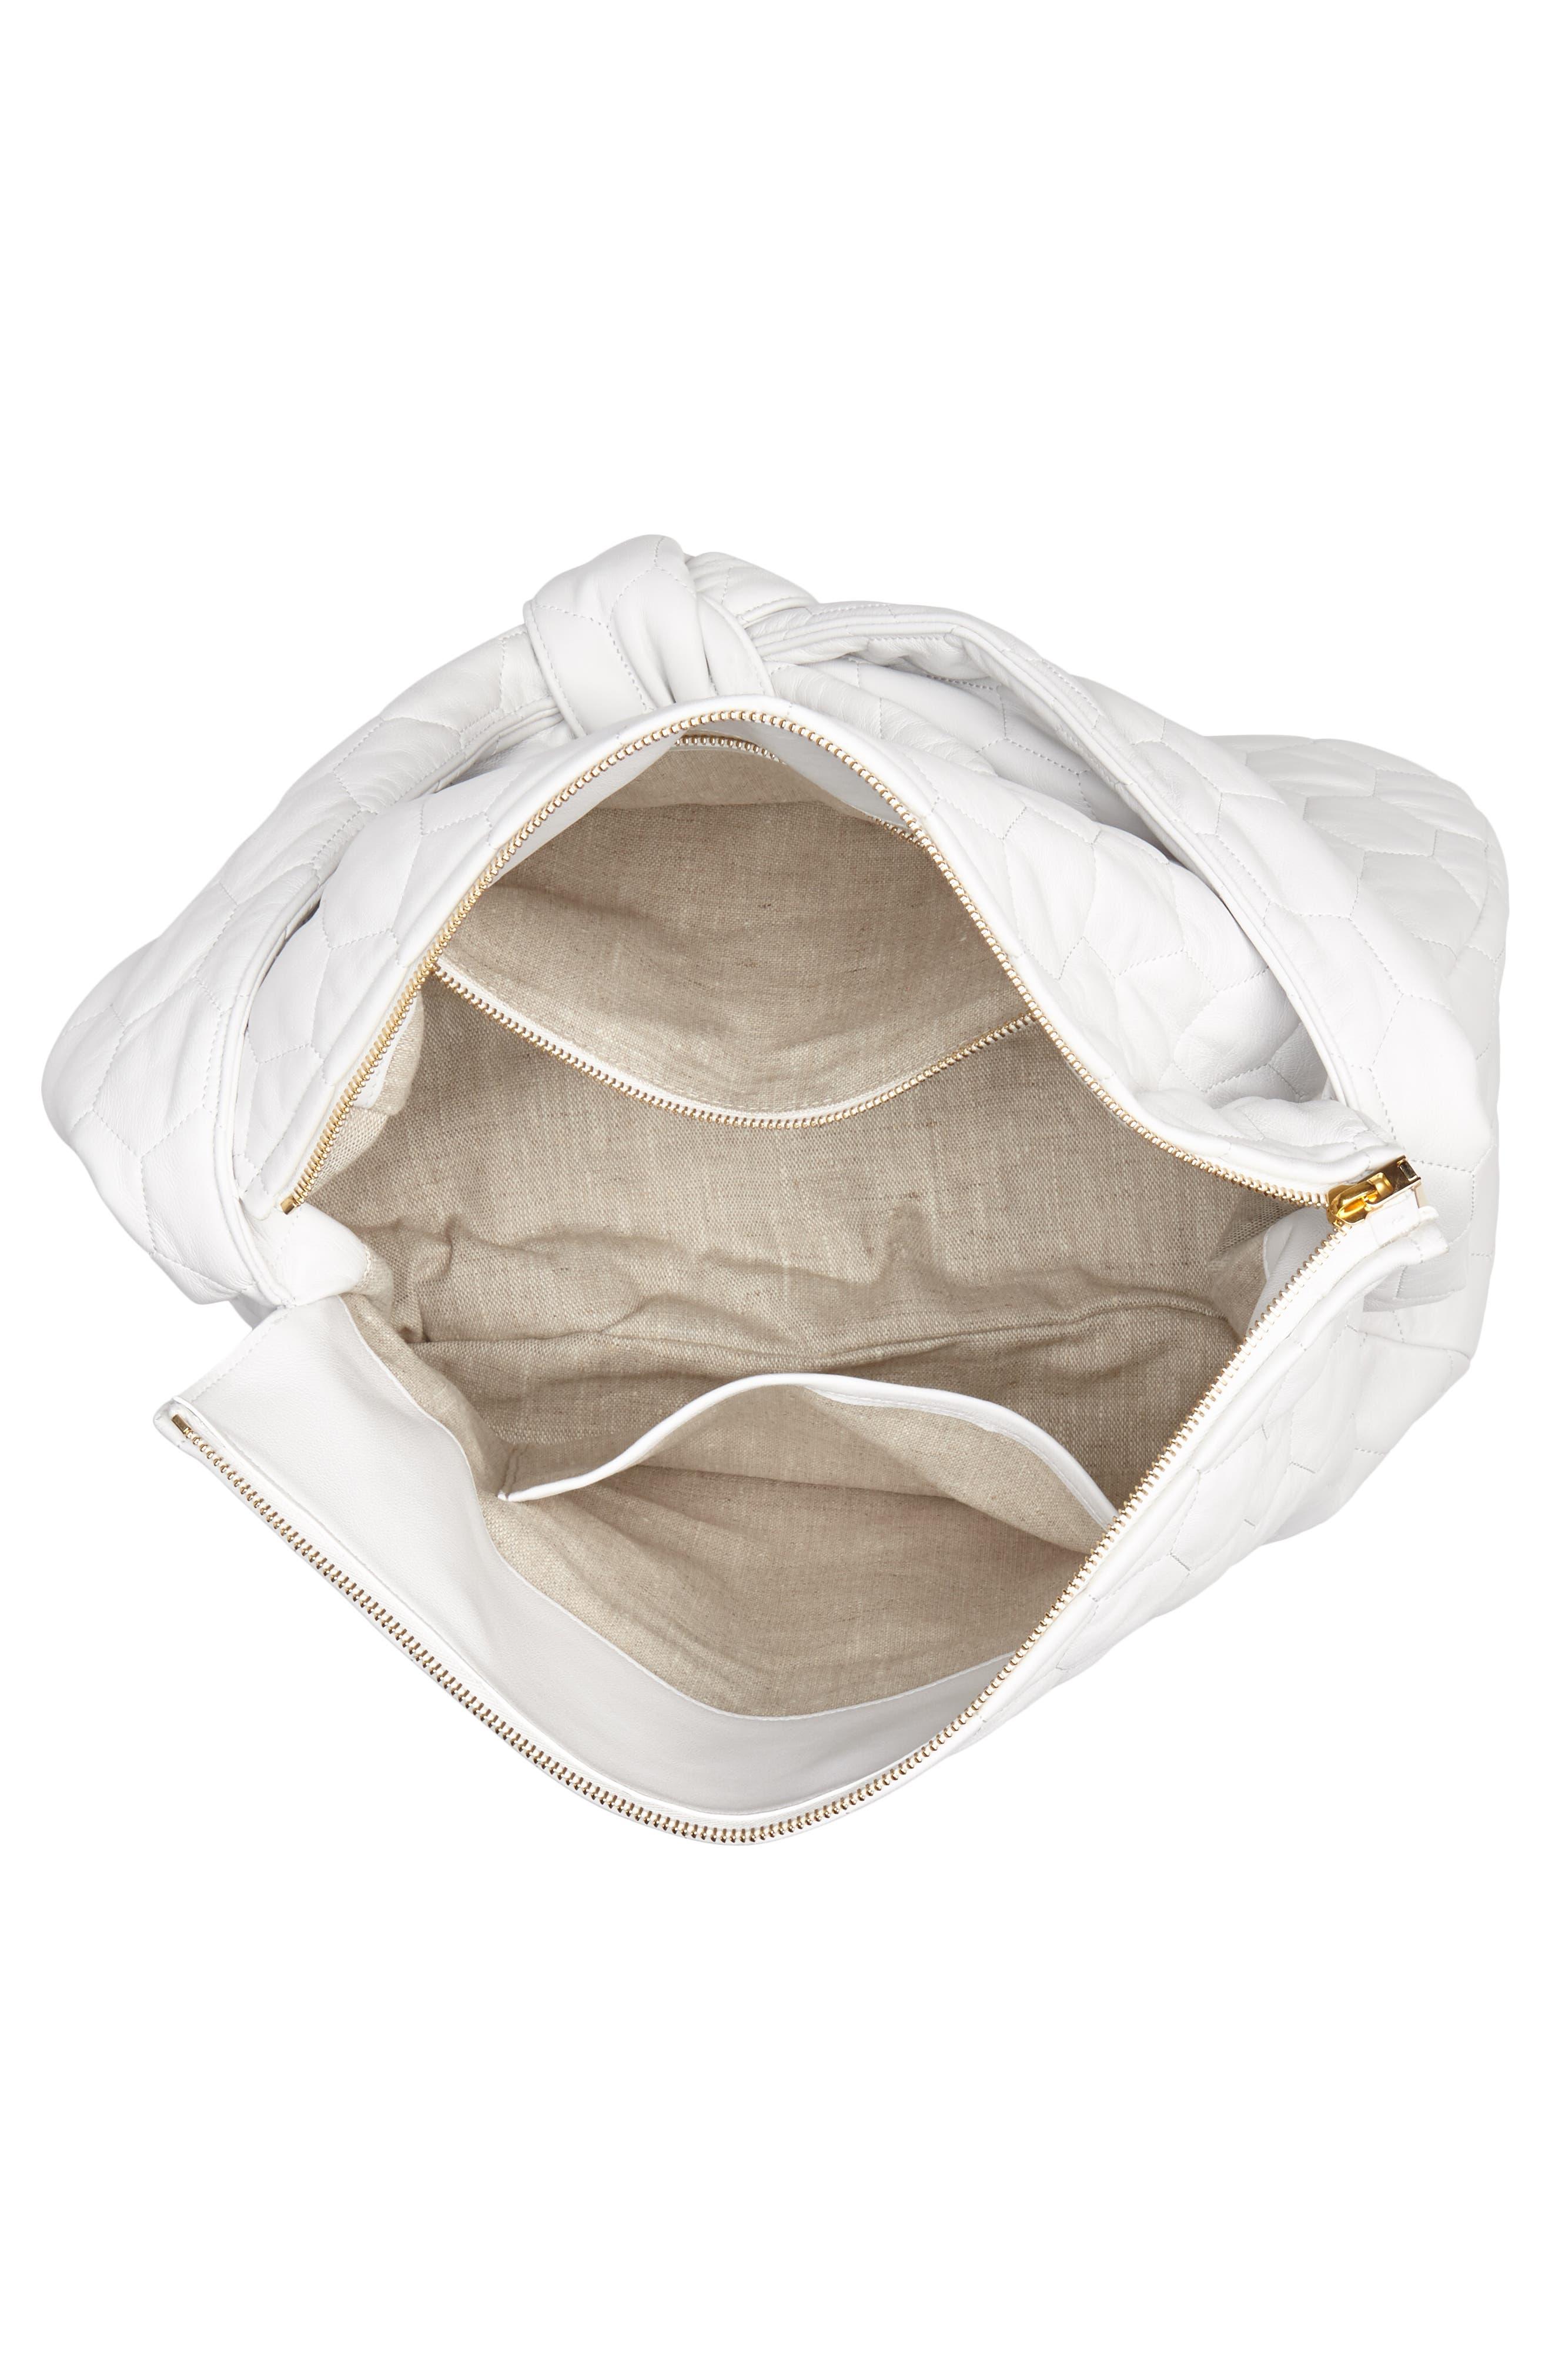 Balloon Leather Shoulder Bag,                             Alternate thumbnail 4, color,                             White